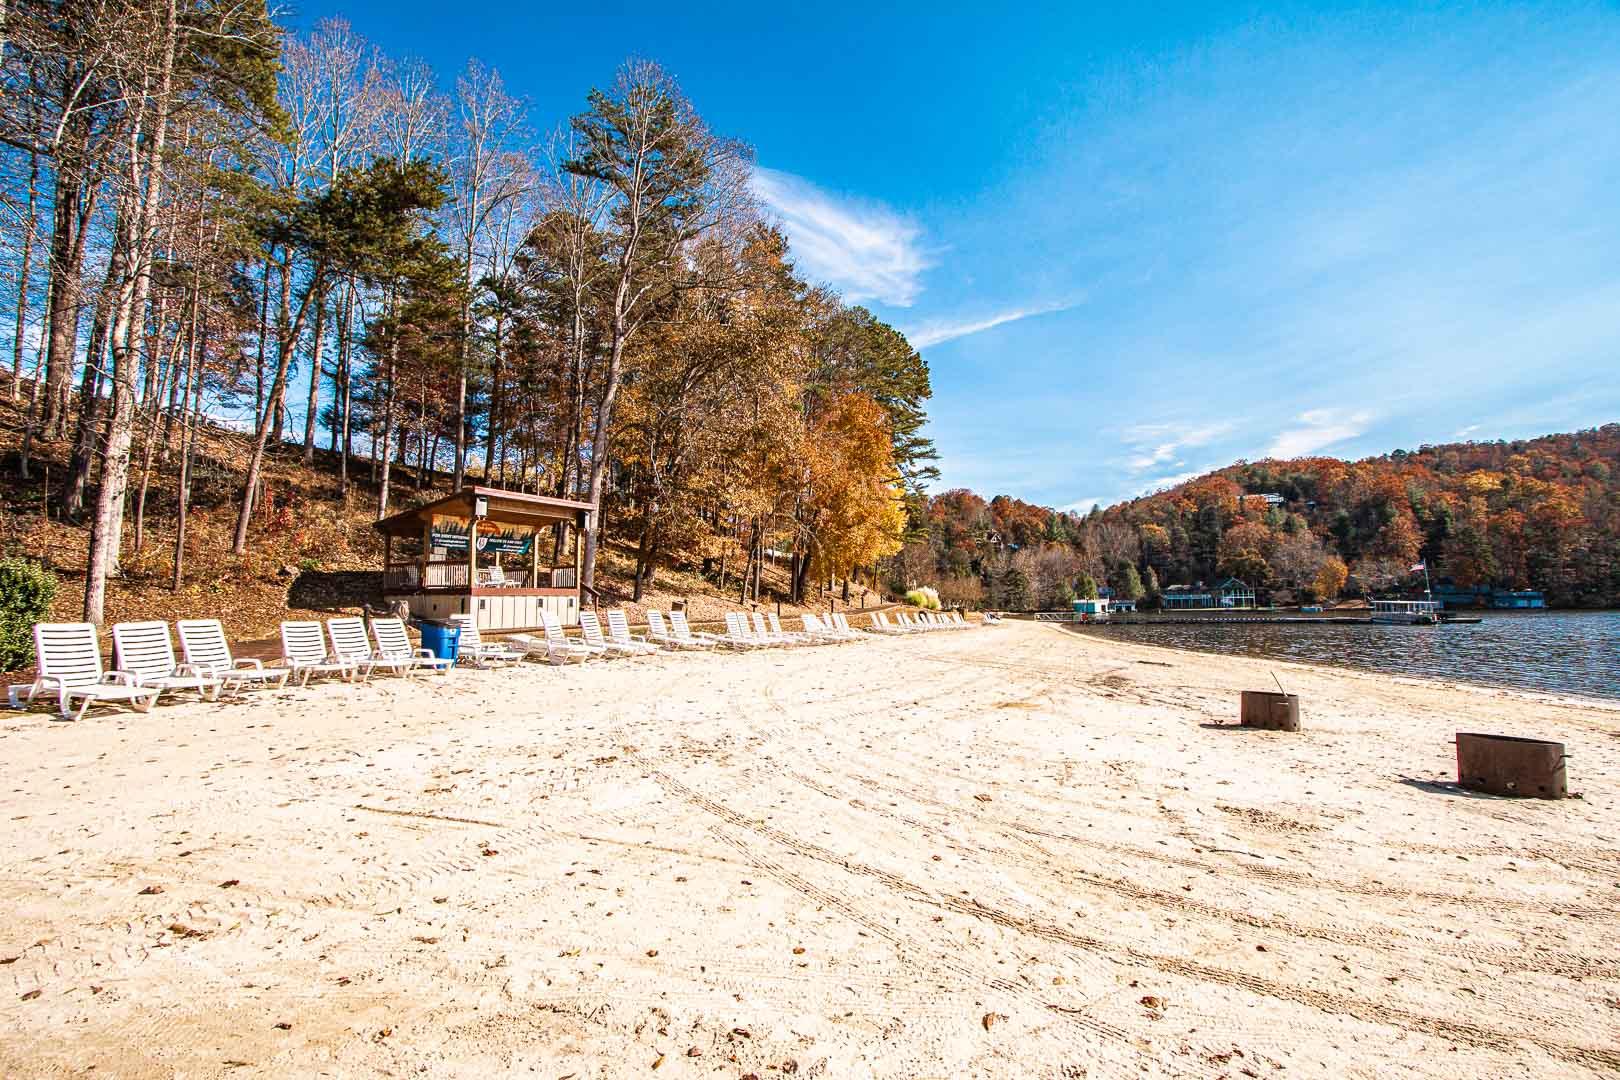 A peaceful view from the lake at VRI's Fox Run Resort in North Carolina.